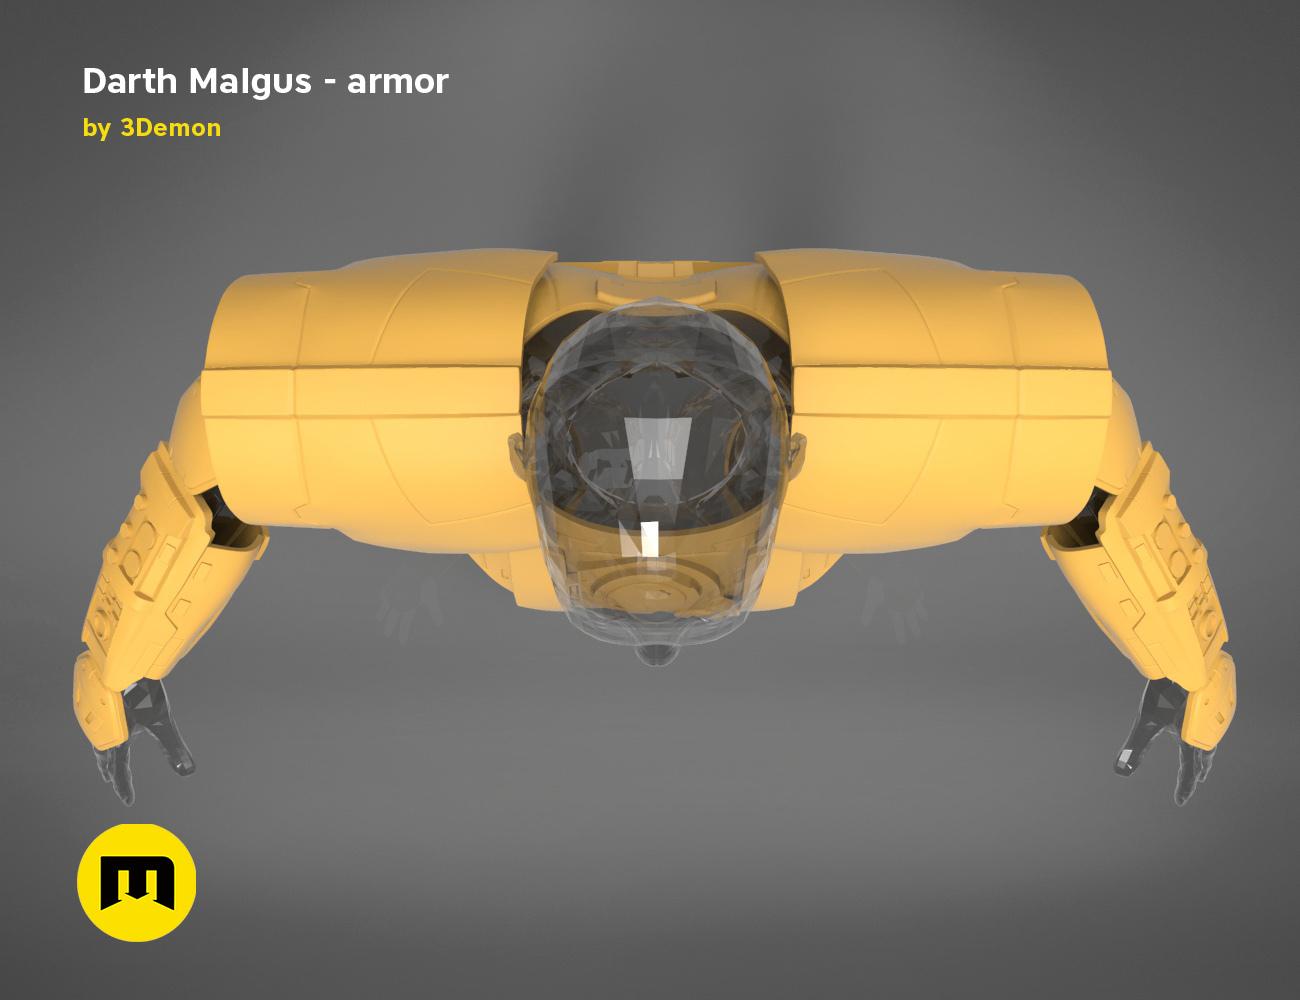 Darth-Malgus-armor-render_scene_basic.105 kopie.jpg Download STL file Darth Malgus's full size armor • Design to 3D print, 3D-mon